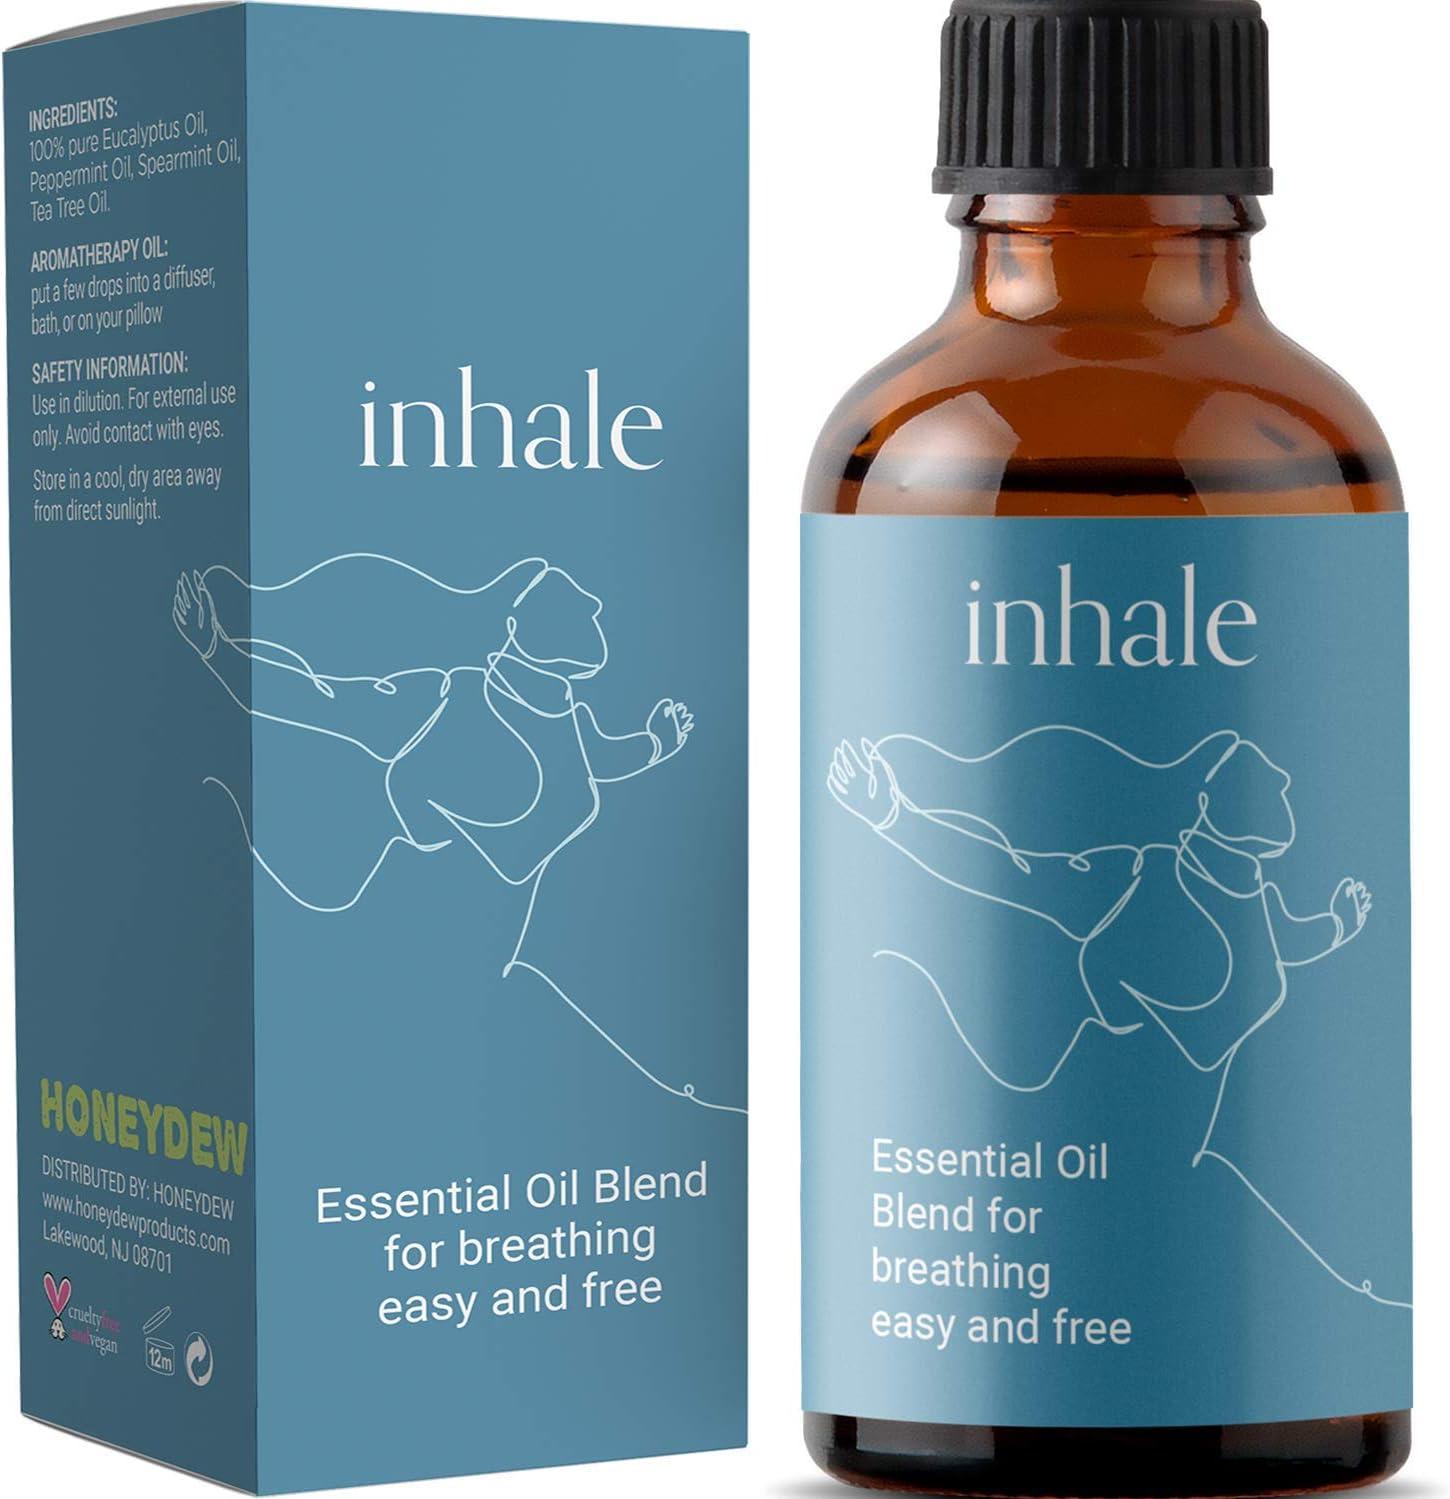 Honeydew Breathe Better Essential Oil Blend for Congestion